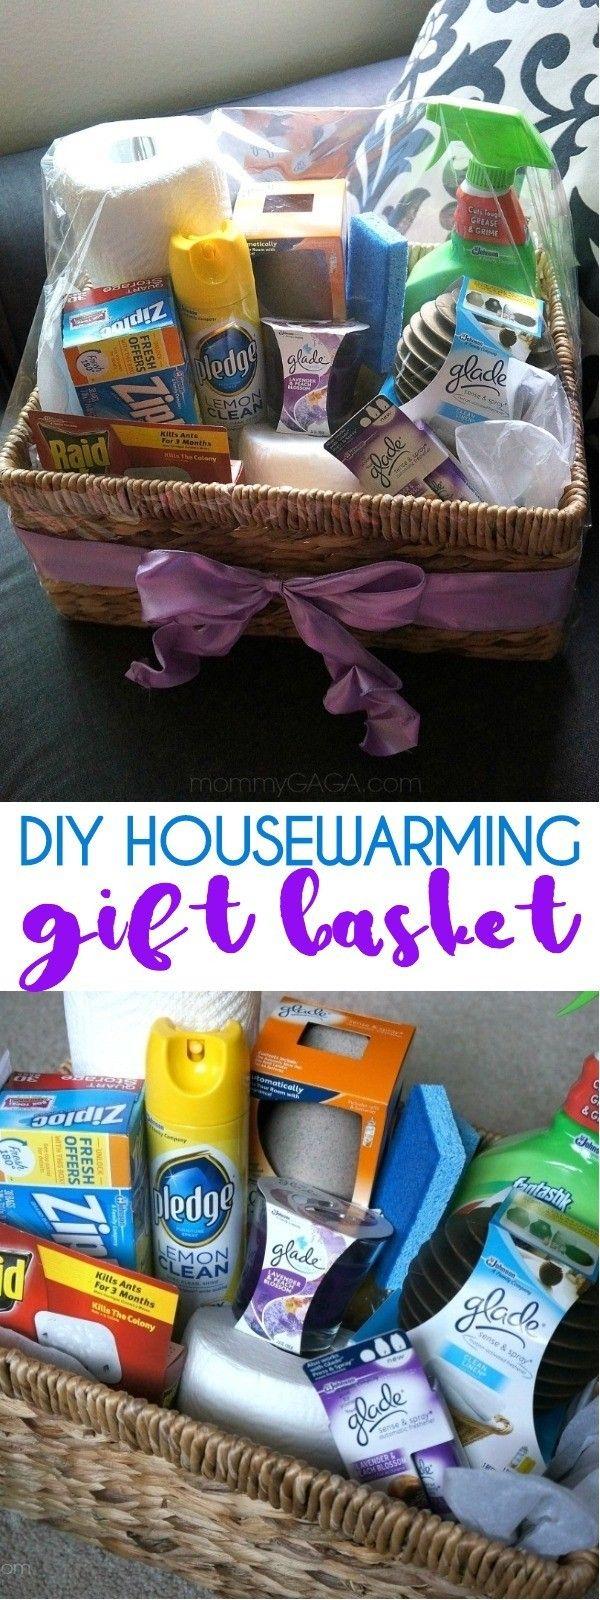 DIY Housewarming Gift Ideas: Make A DIY Home Essentials Gift Basket! #boyfriendgiftbasket